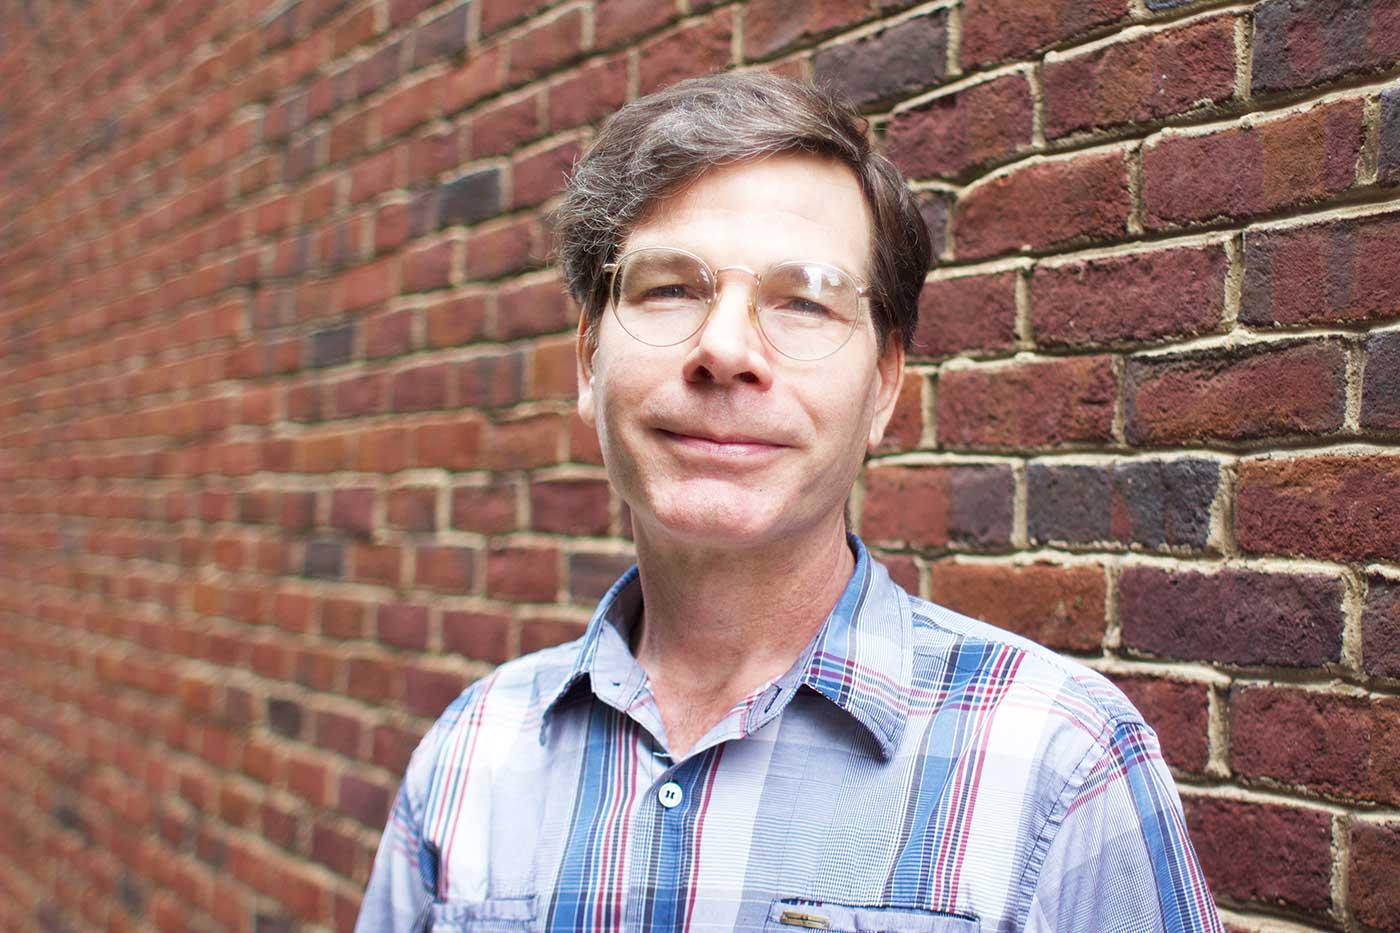 John Peters in Alpharetta, GA